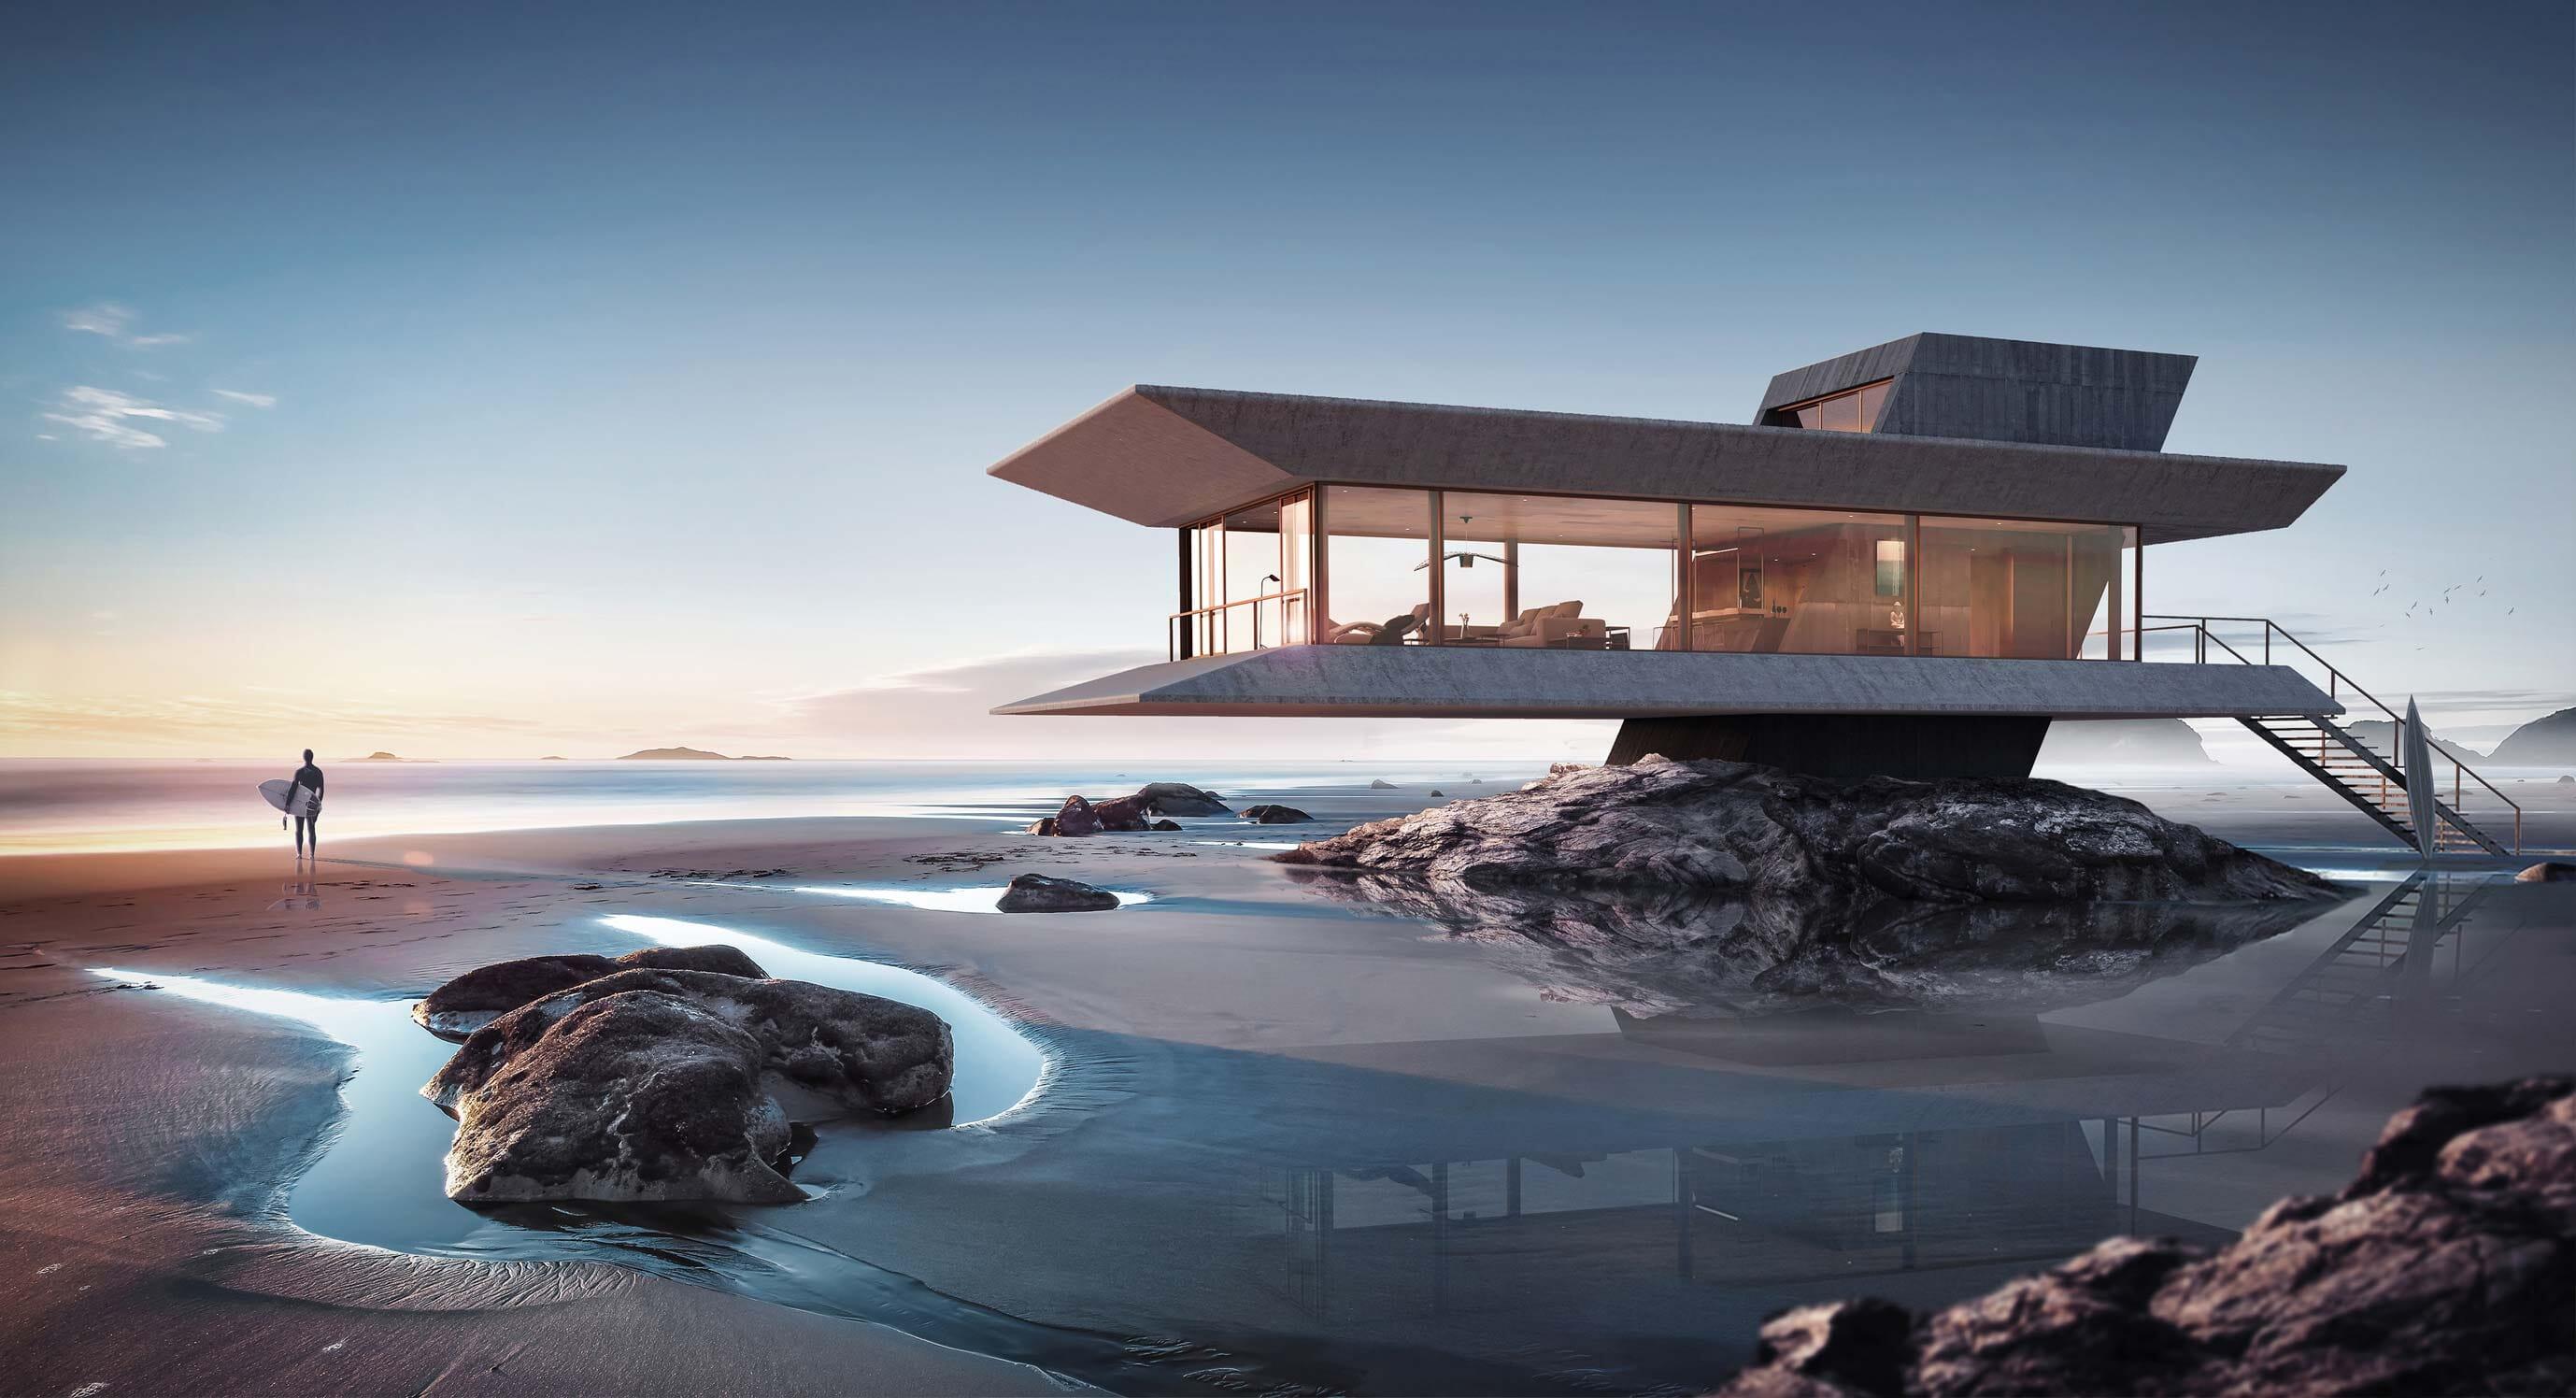 Monolit Beach House Is a Futuristic Coastal Getaway